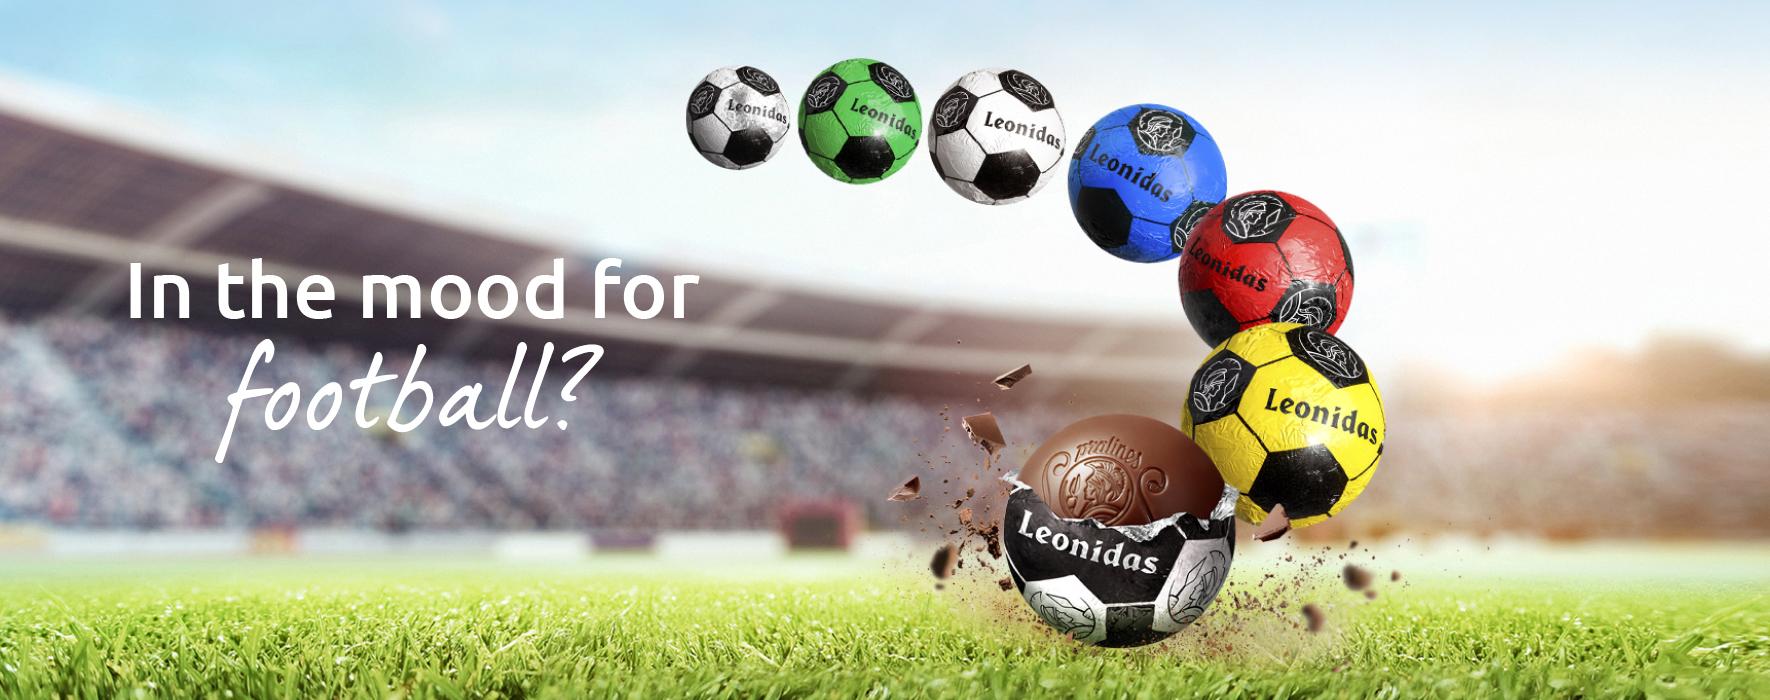 Leonidas Football Assortment   Quick Delivery   LEONIDAS ONLINE